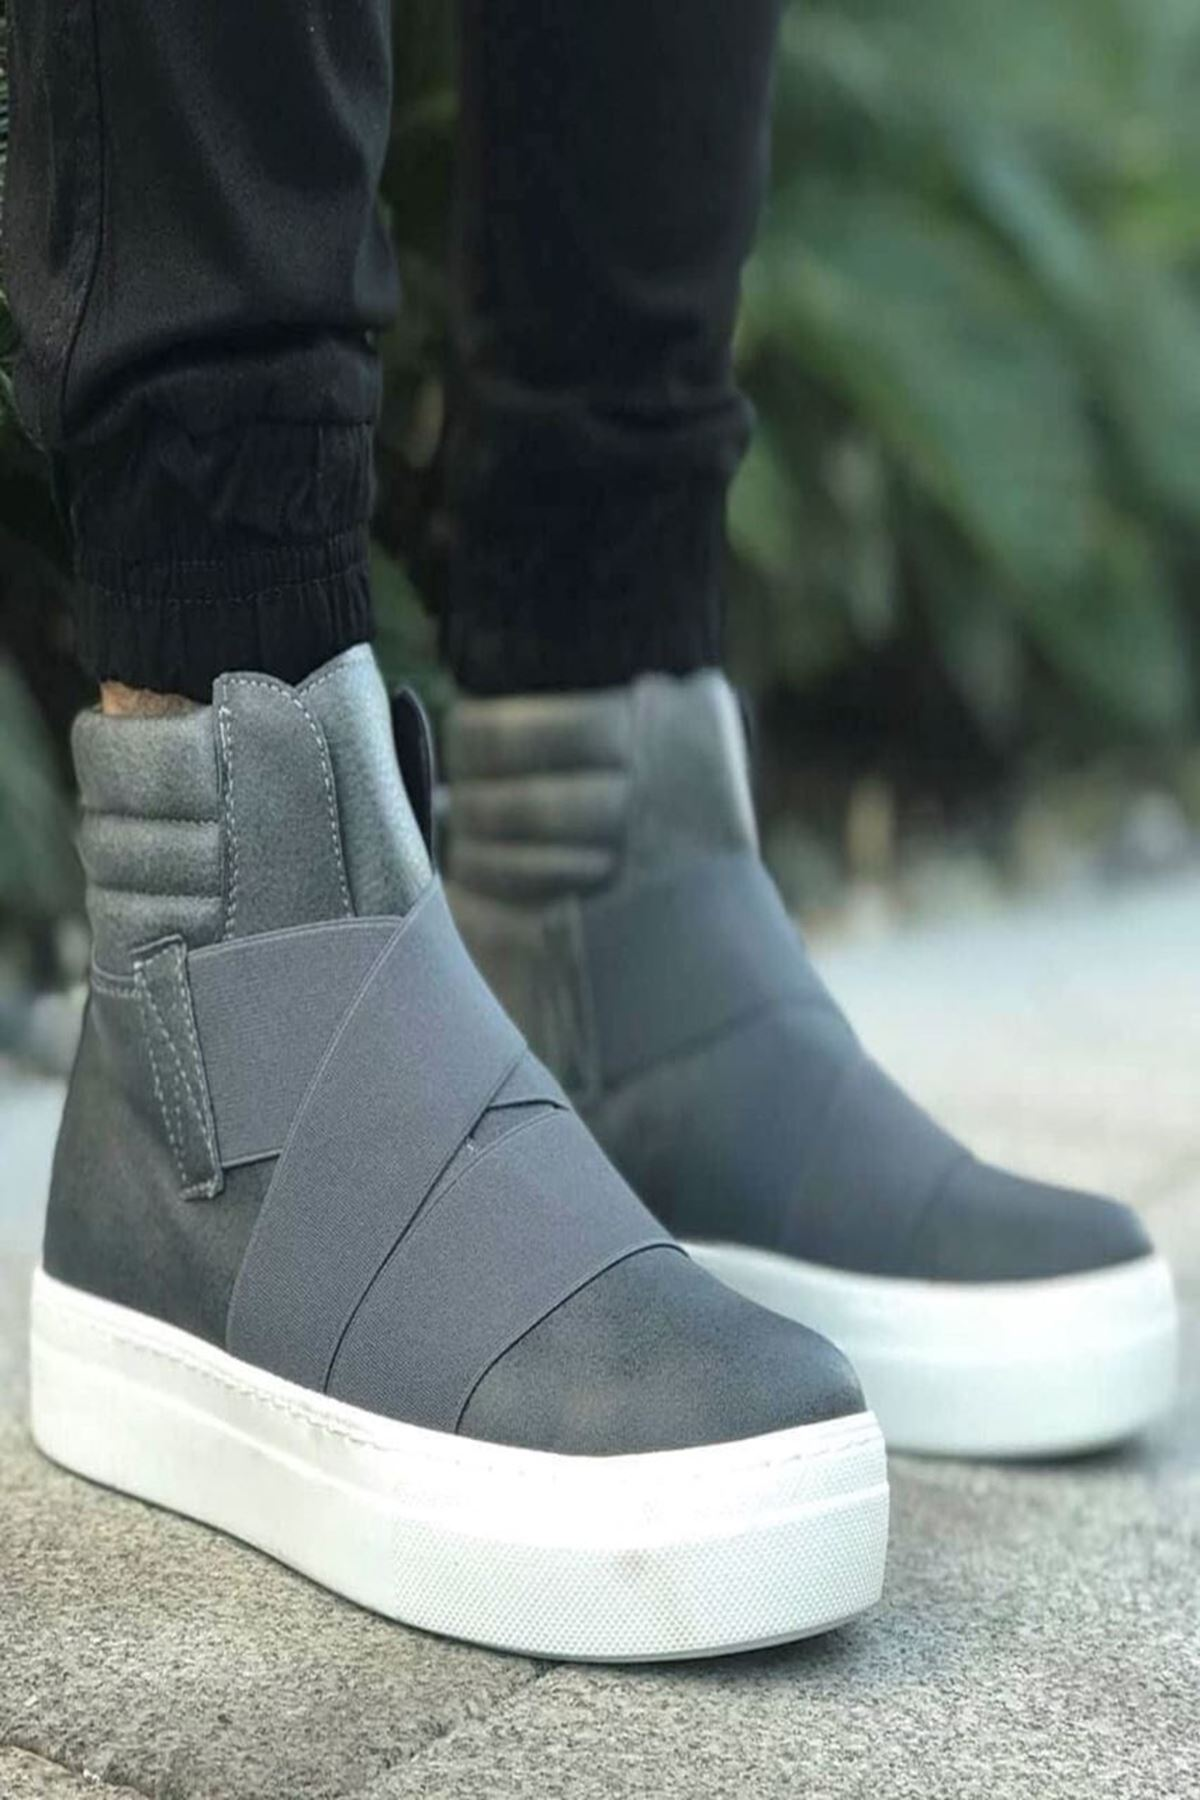 Berde Erkek Ayakkabı CH023C15489AT